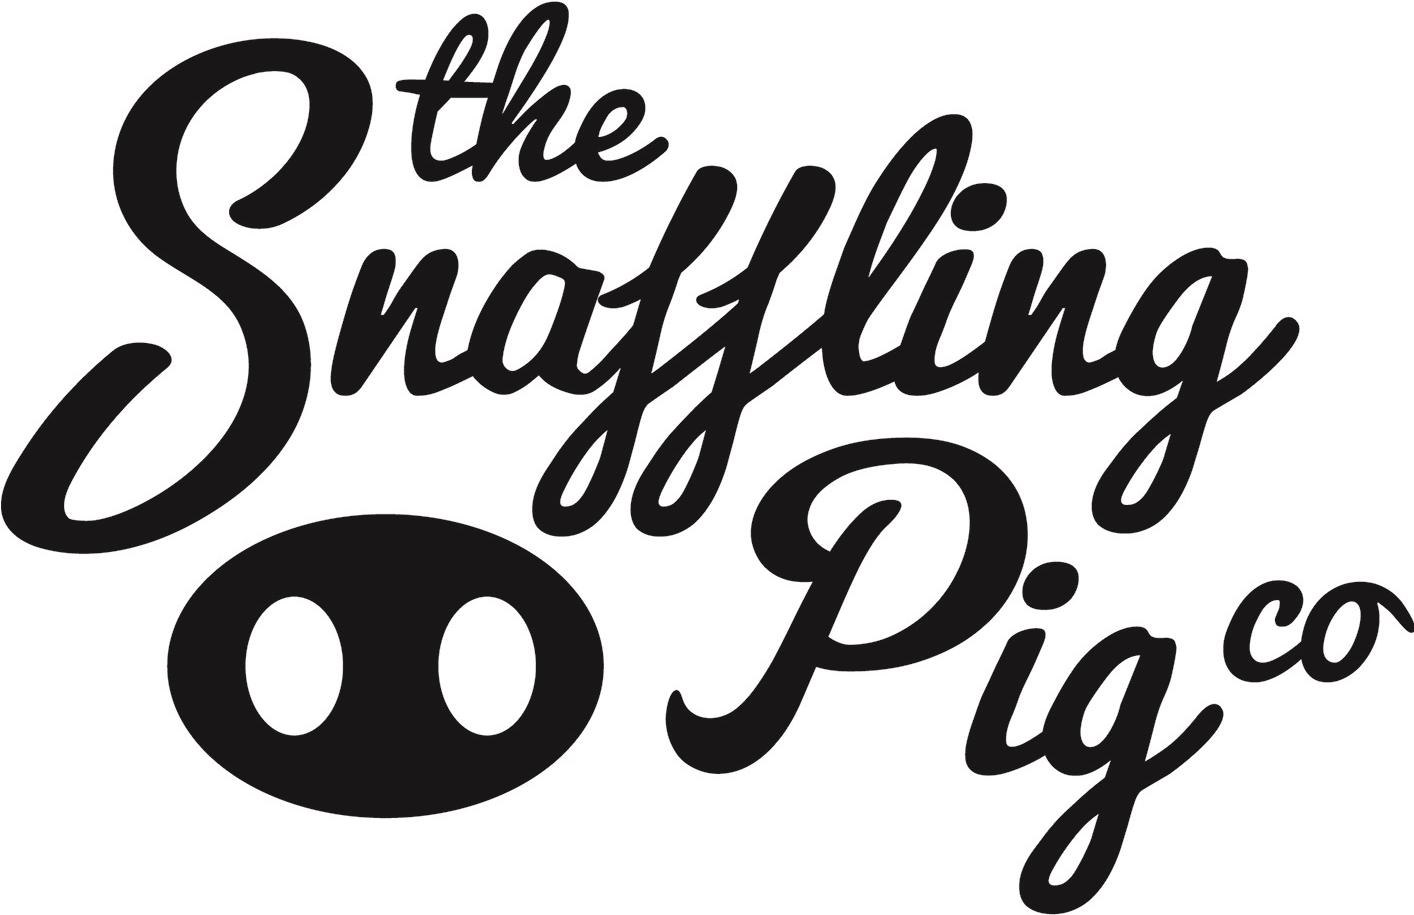 The Snaffling Pig Co.